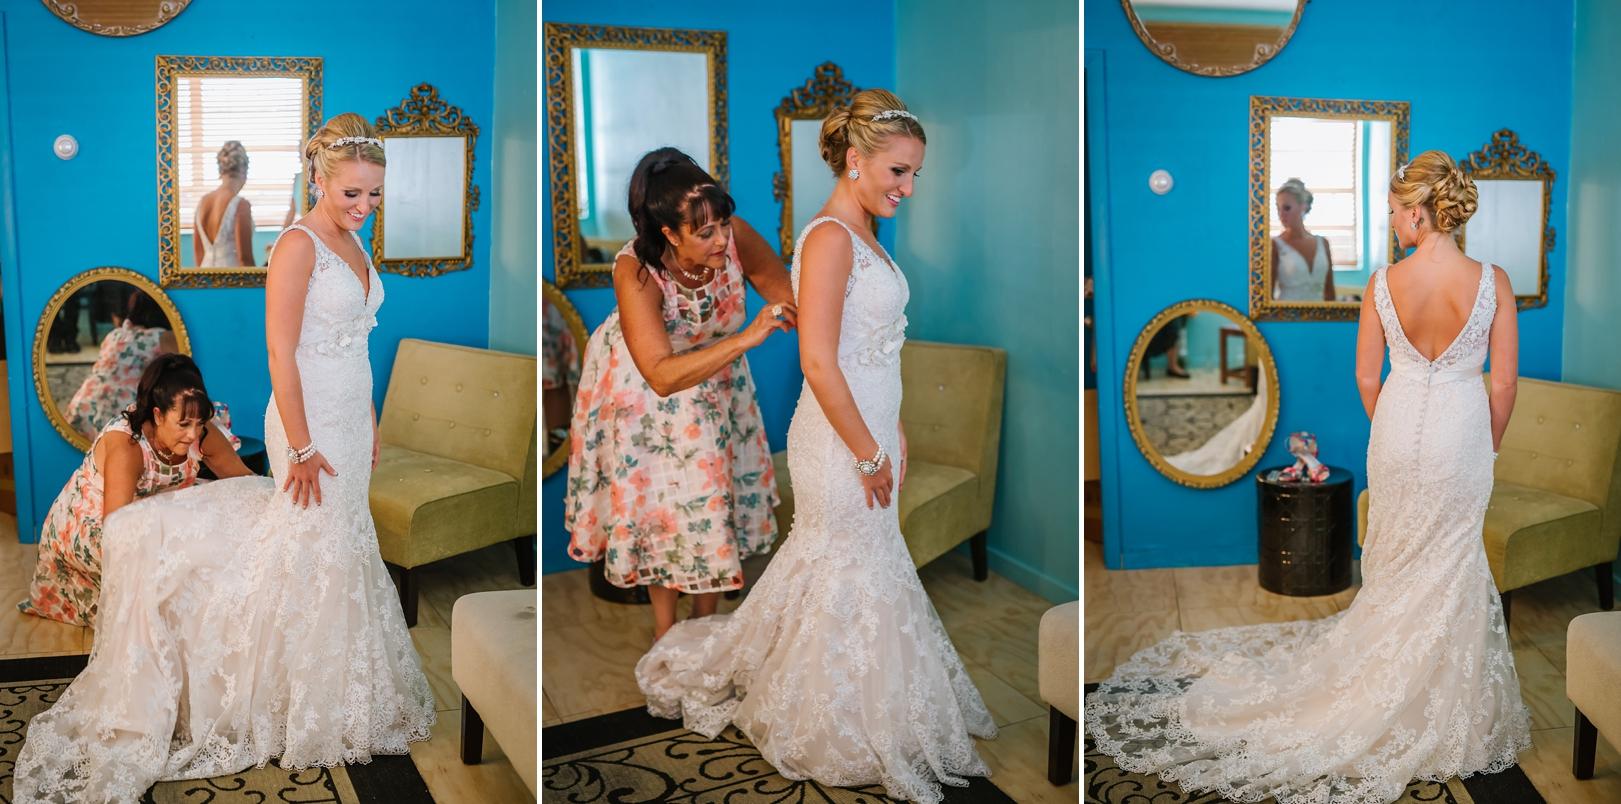 st-pete-postcard-inn-colorful-diy-wedding-photography_0006.jpg